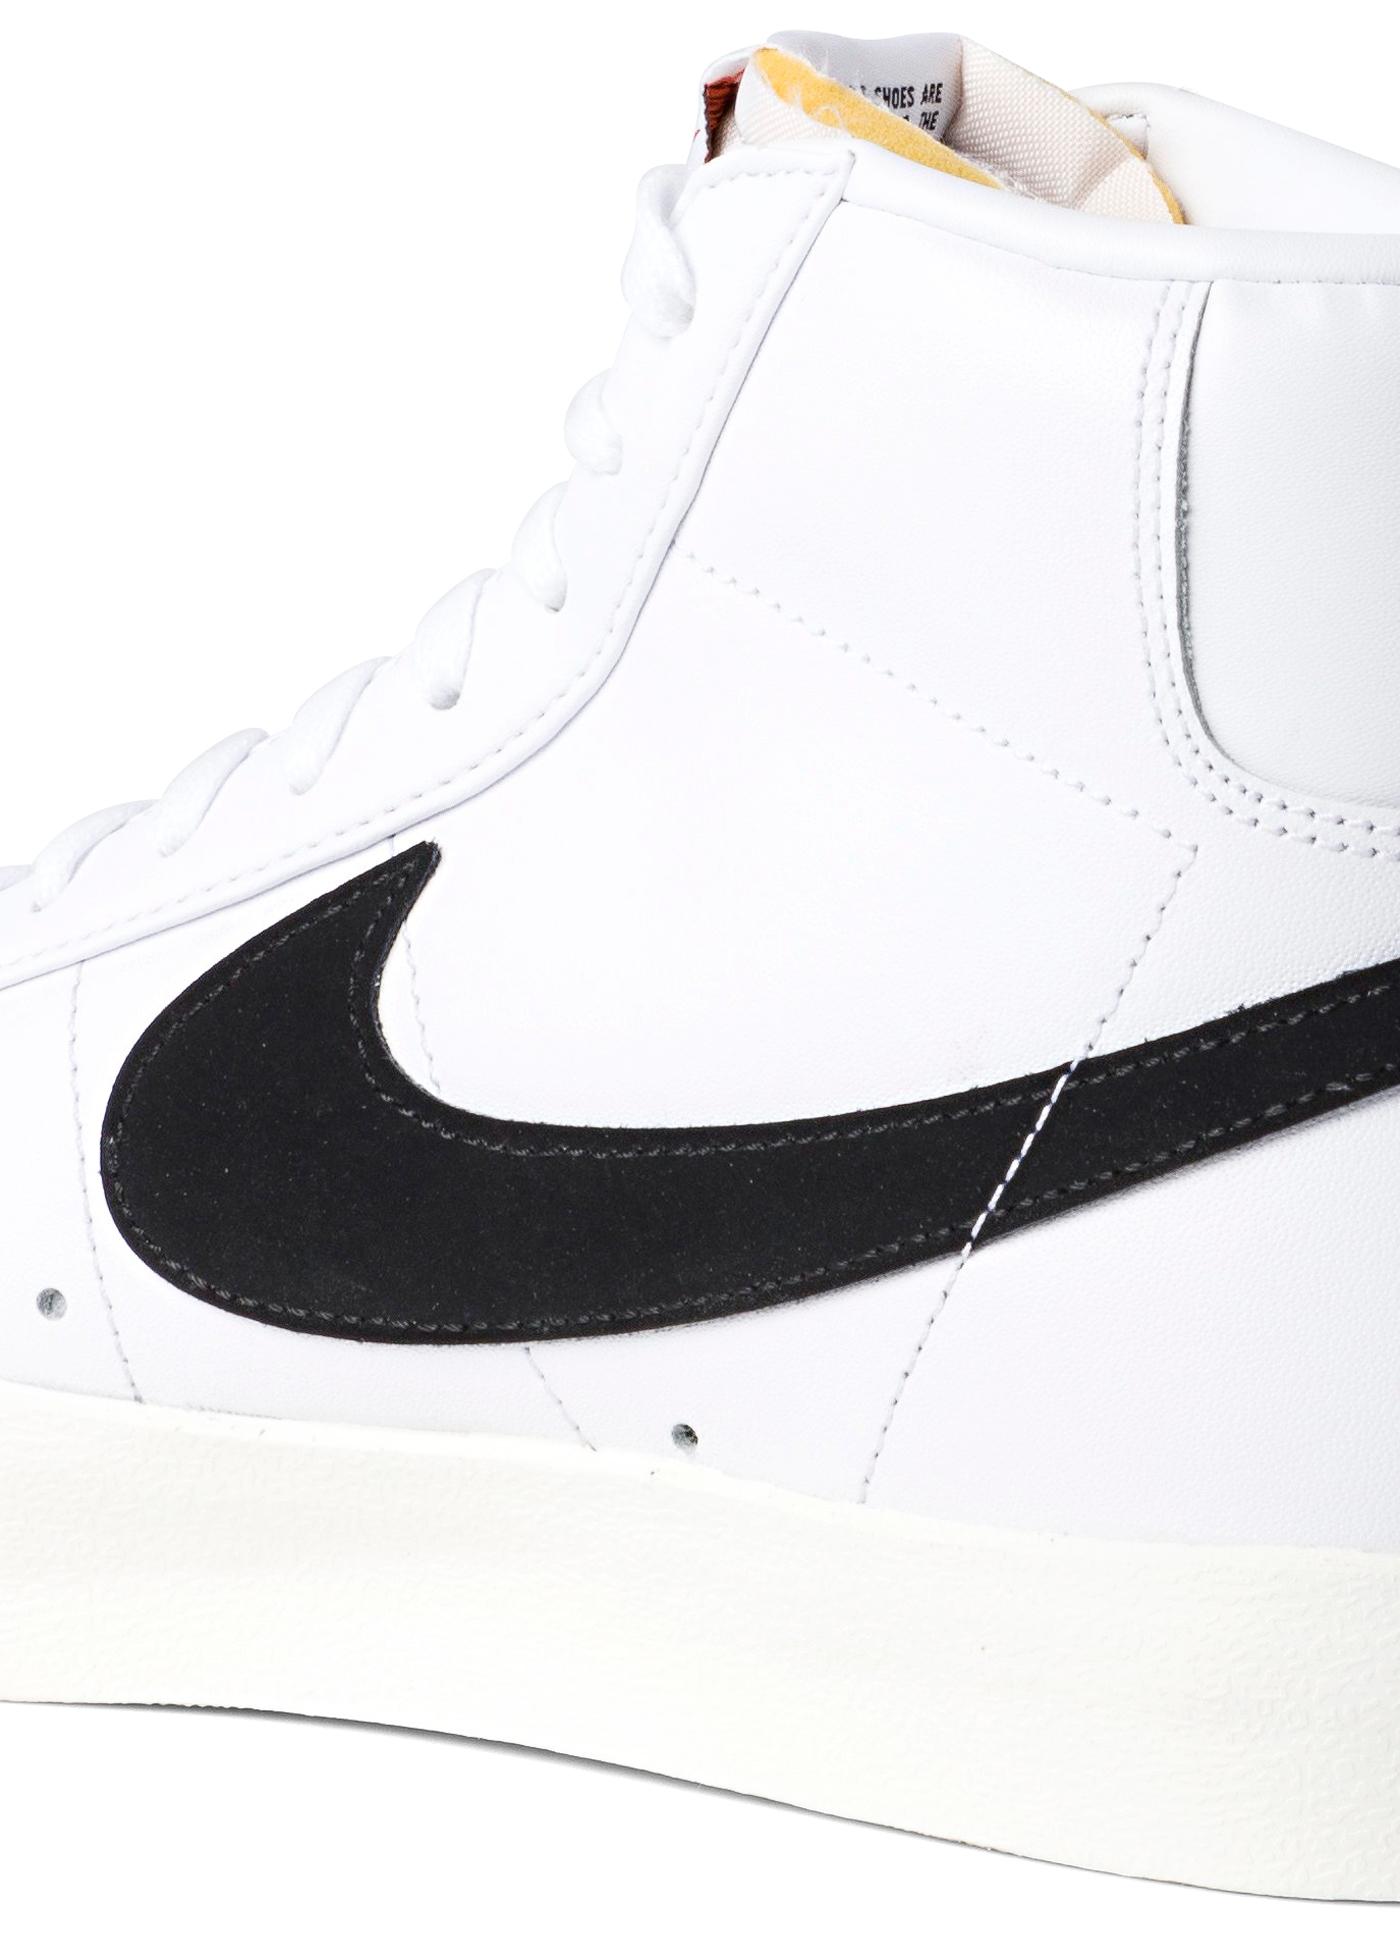 Nike Blazer Mid '77 Vintage image number 3